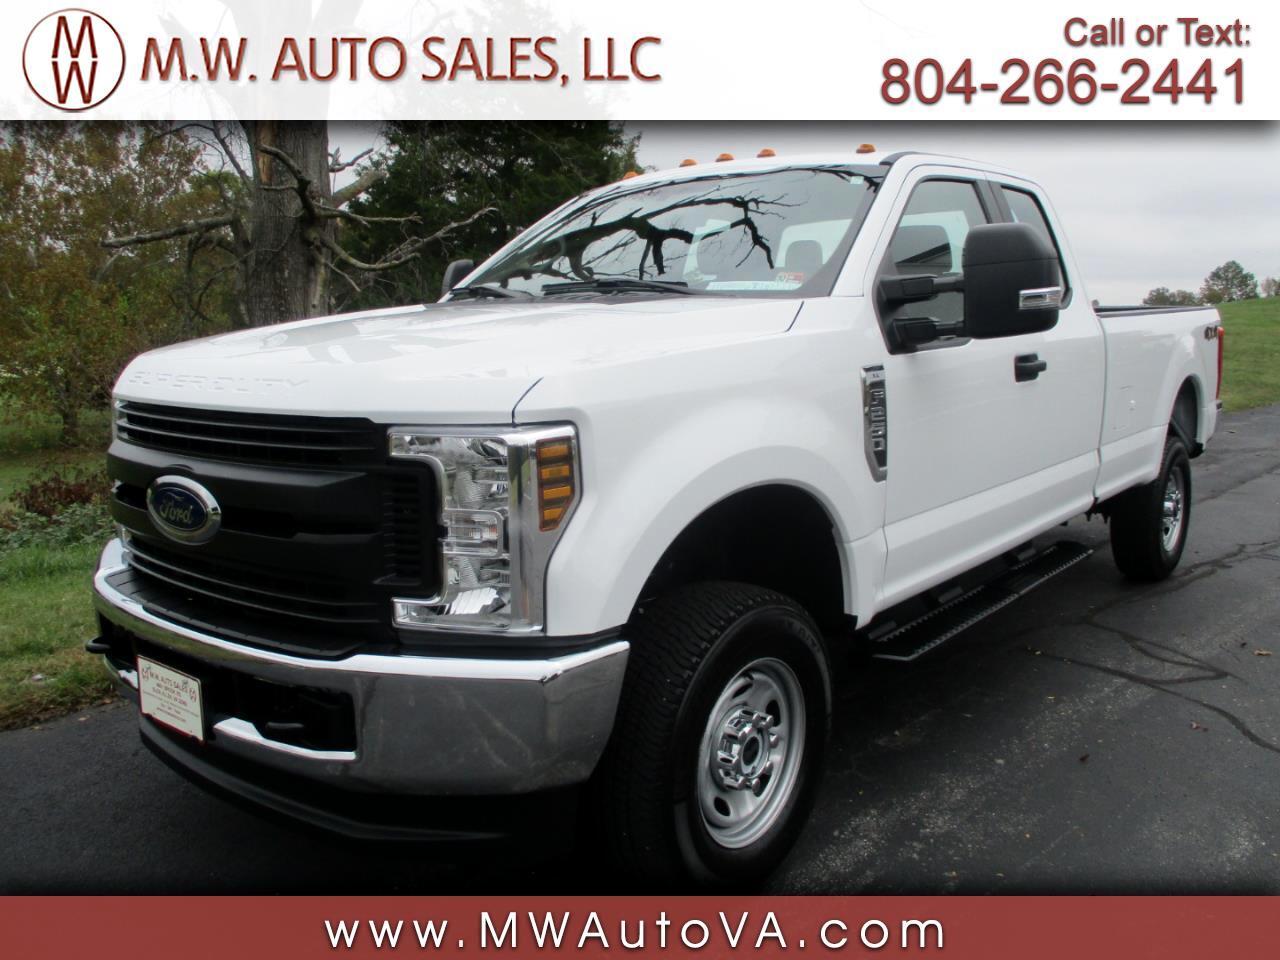 used cars richmond va used cars trucks va m w auto sales used cars trucks va m w auto sales